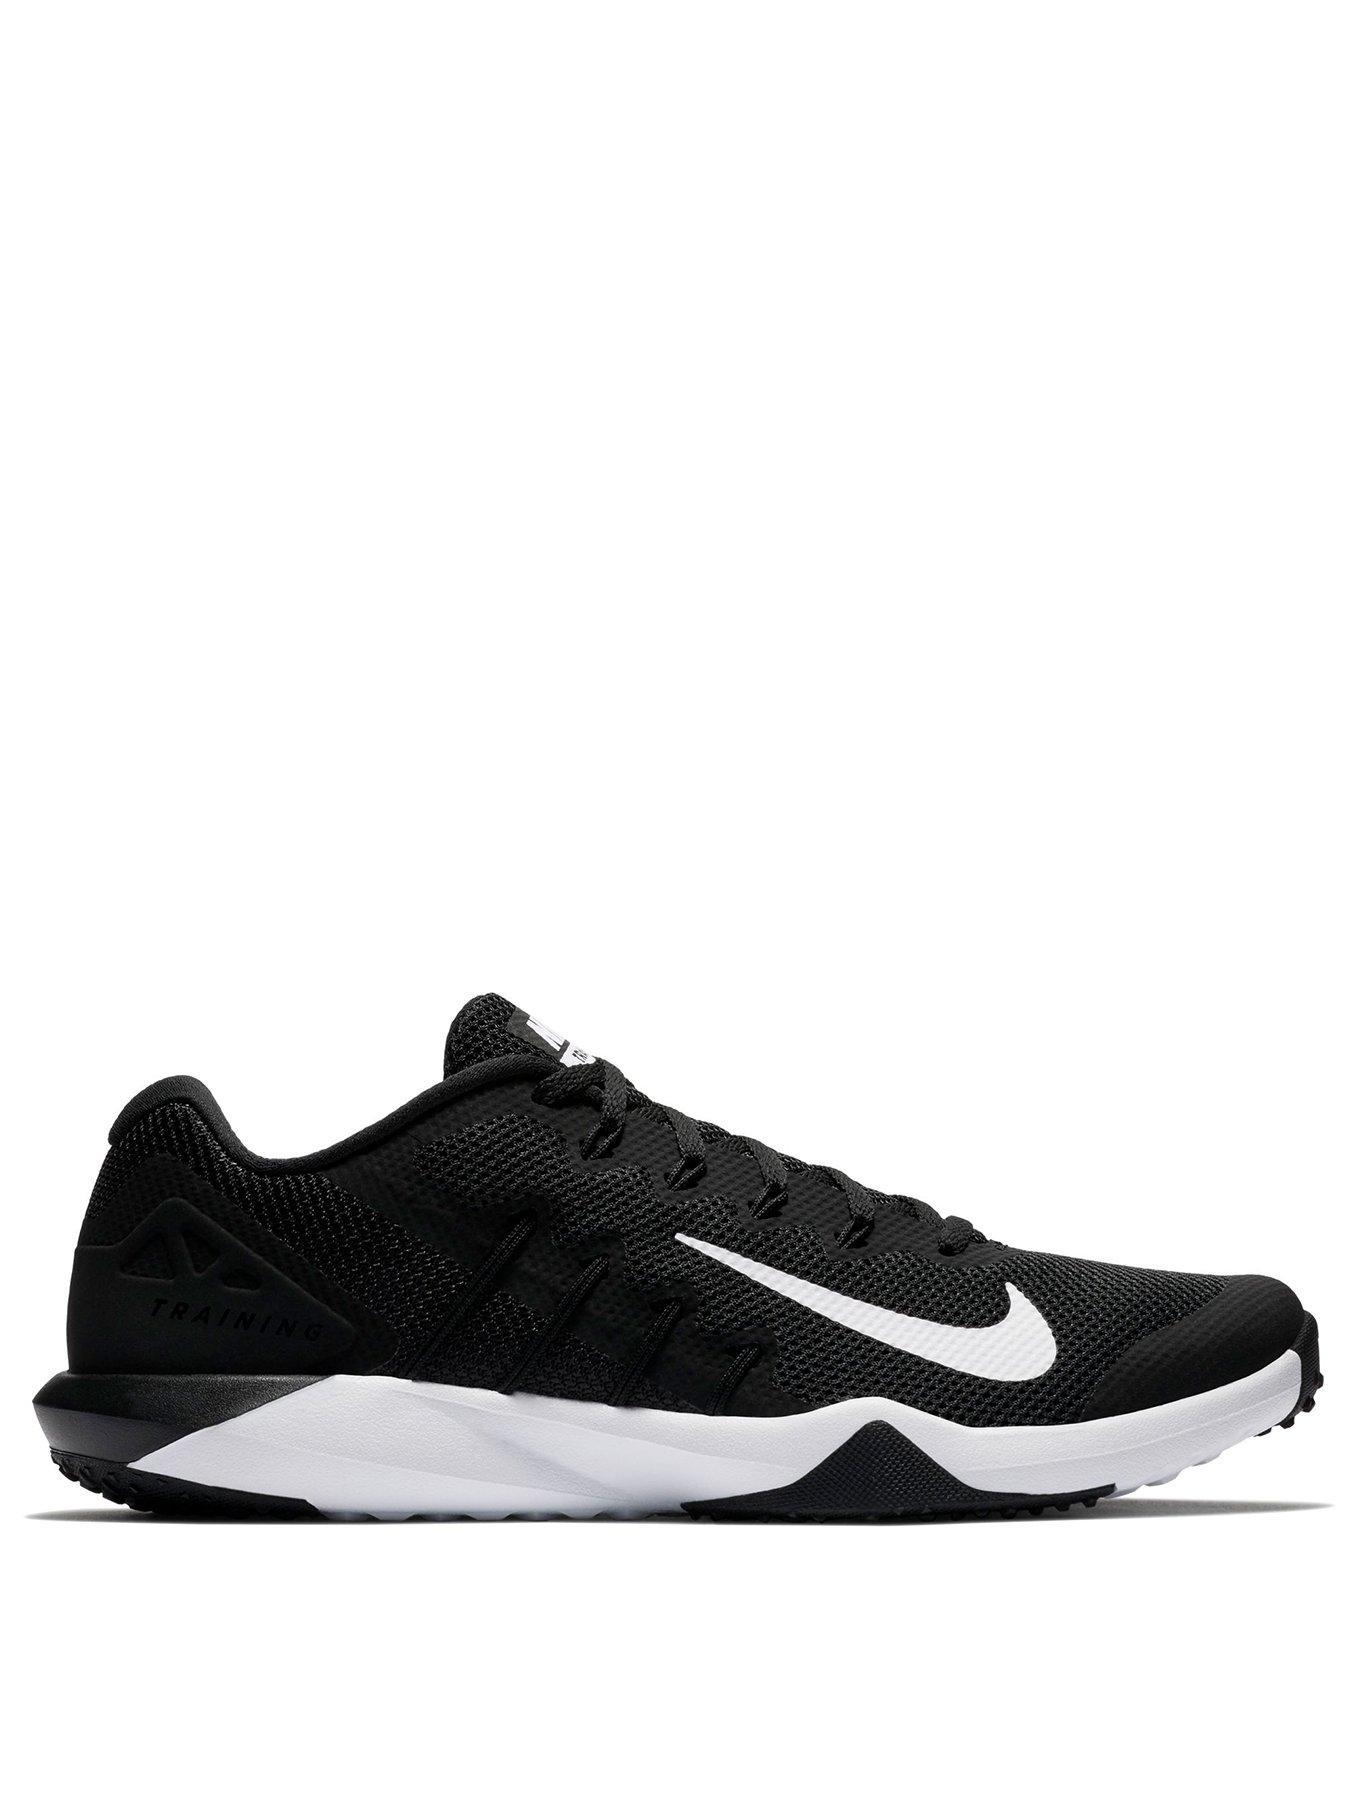 nike mens trainers air max 90 roshe littlewoods Platform Shoes for Men nike retaliation tr 2